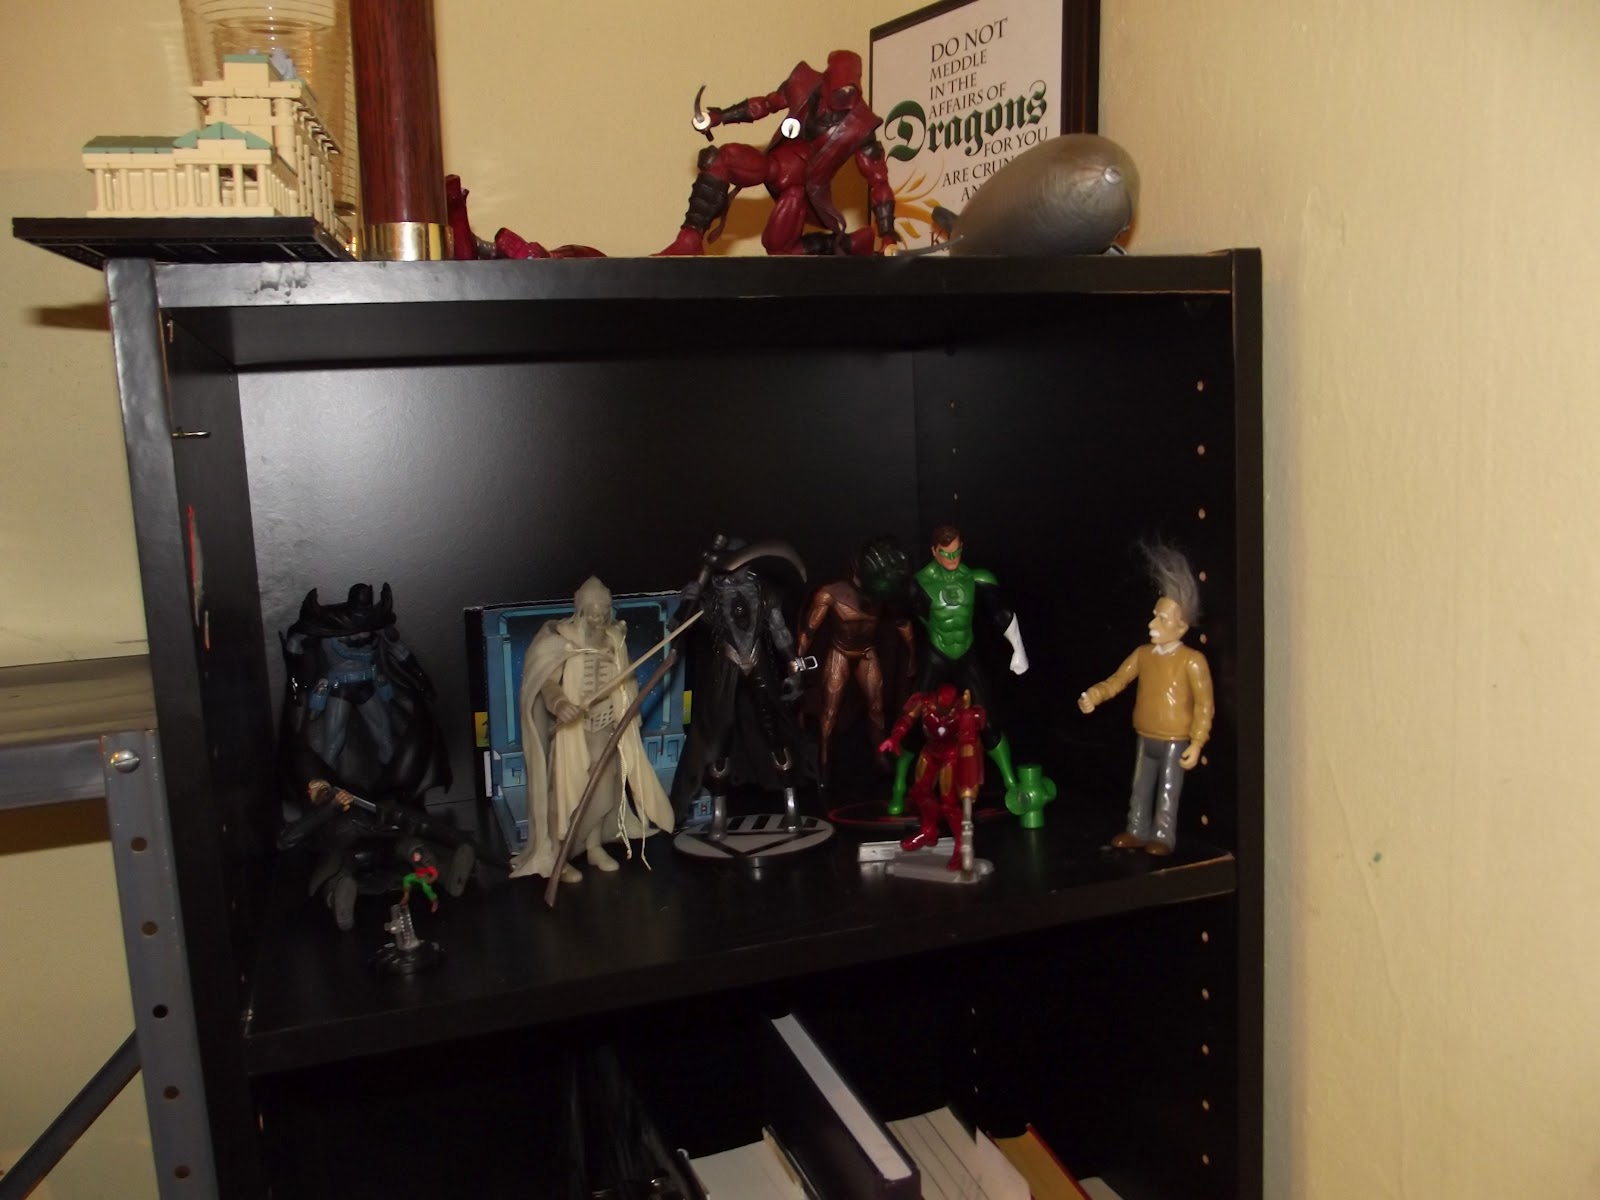 Action figures on a black shelf